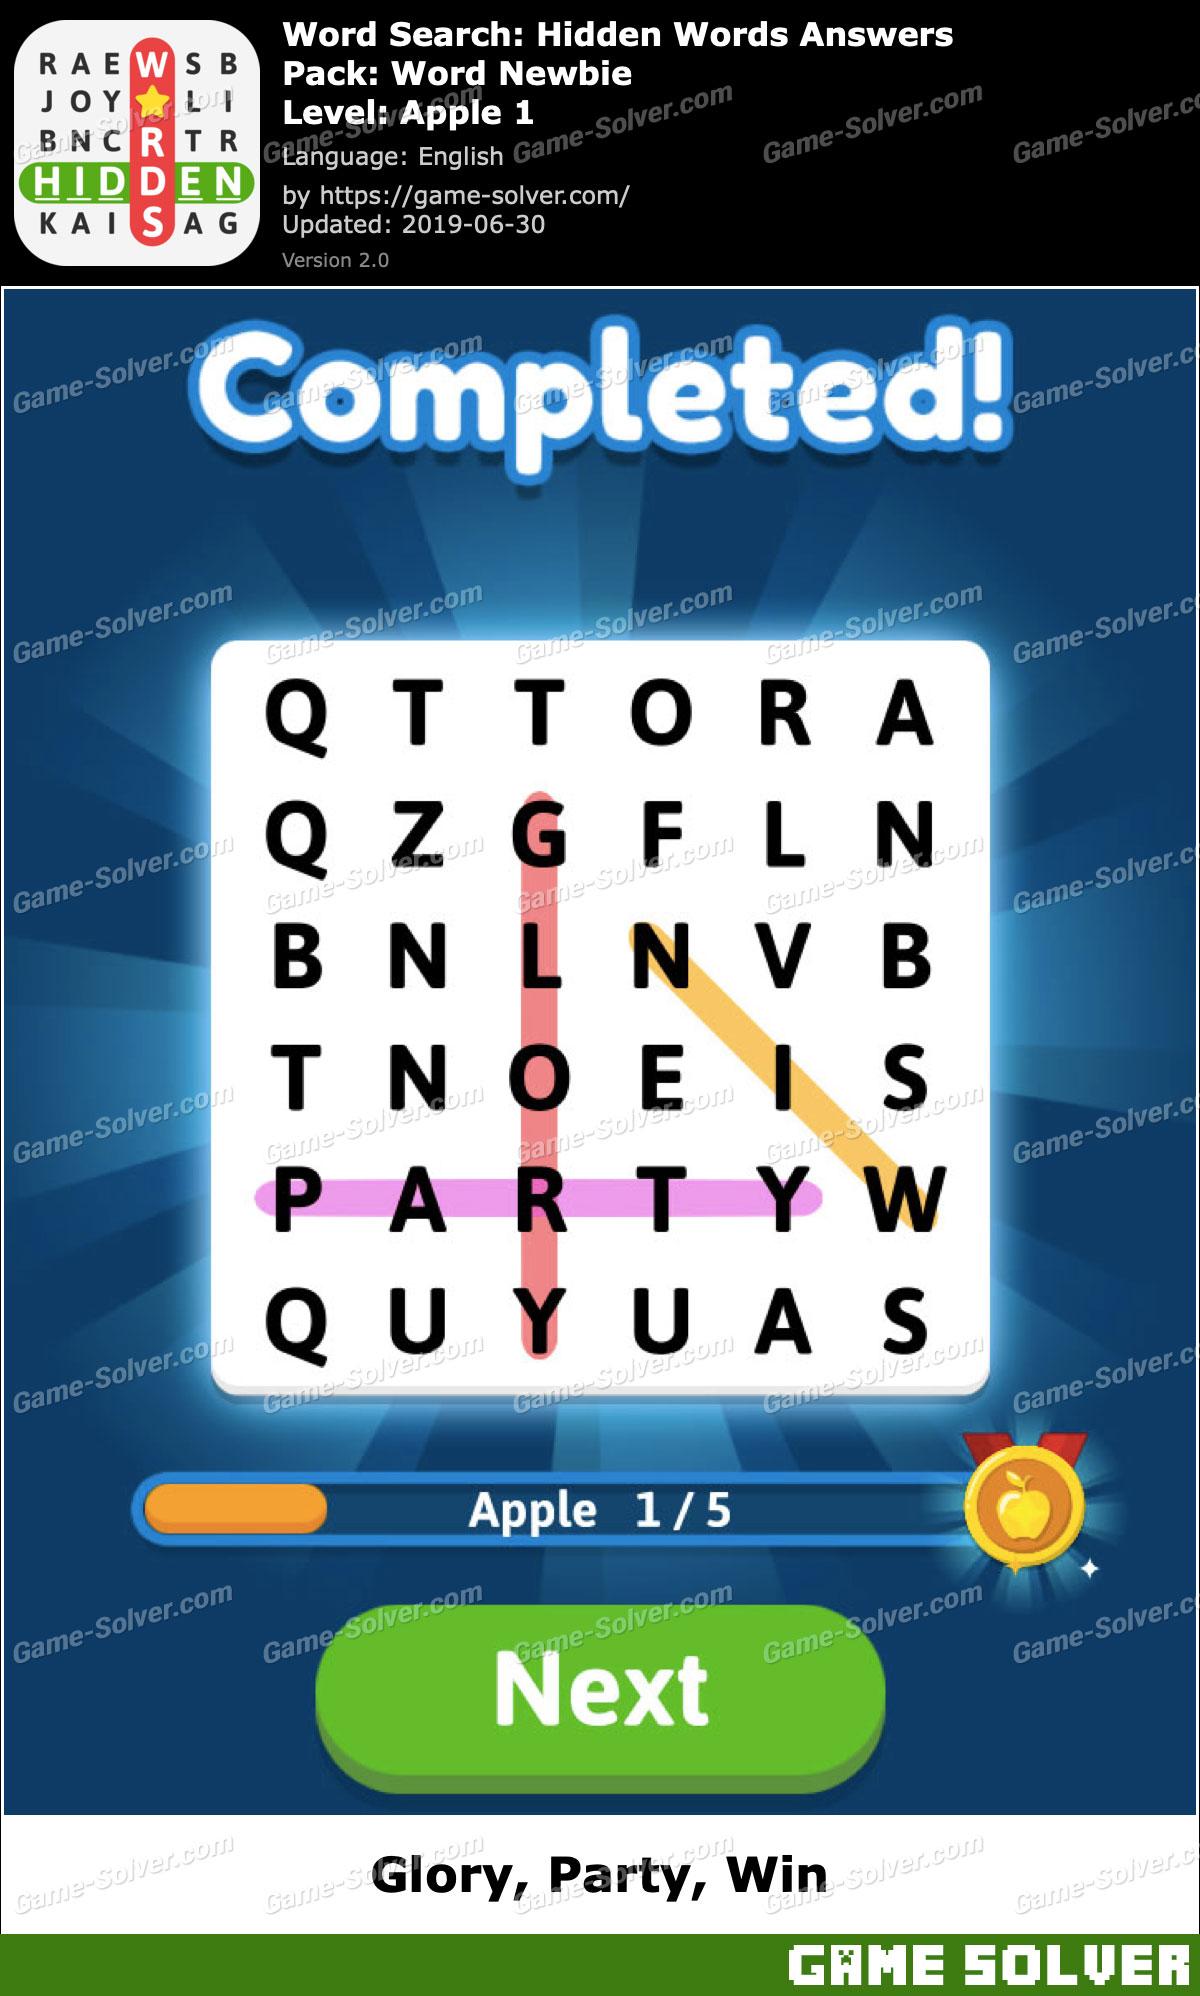 Word Search Hidden Words Word Newbie-Apple 1 Answers